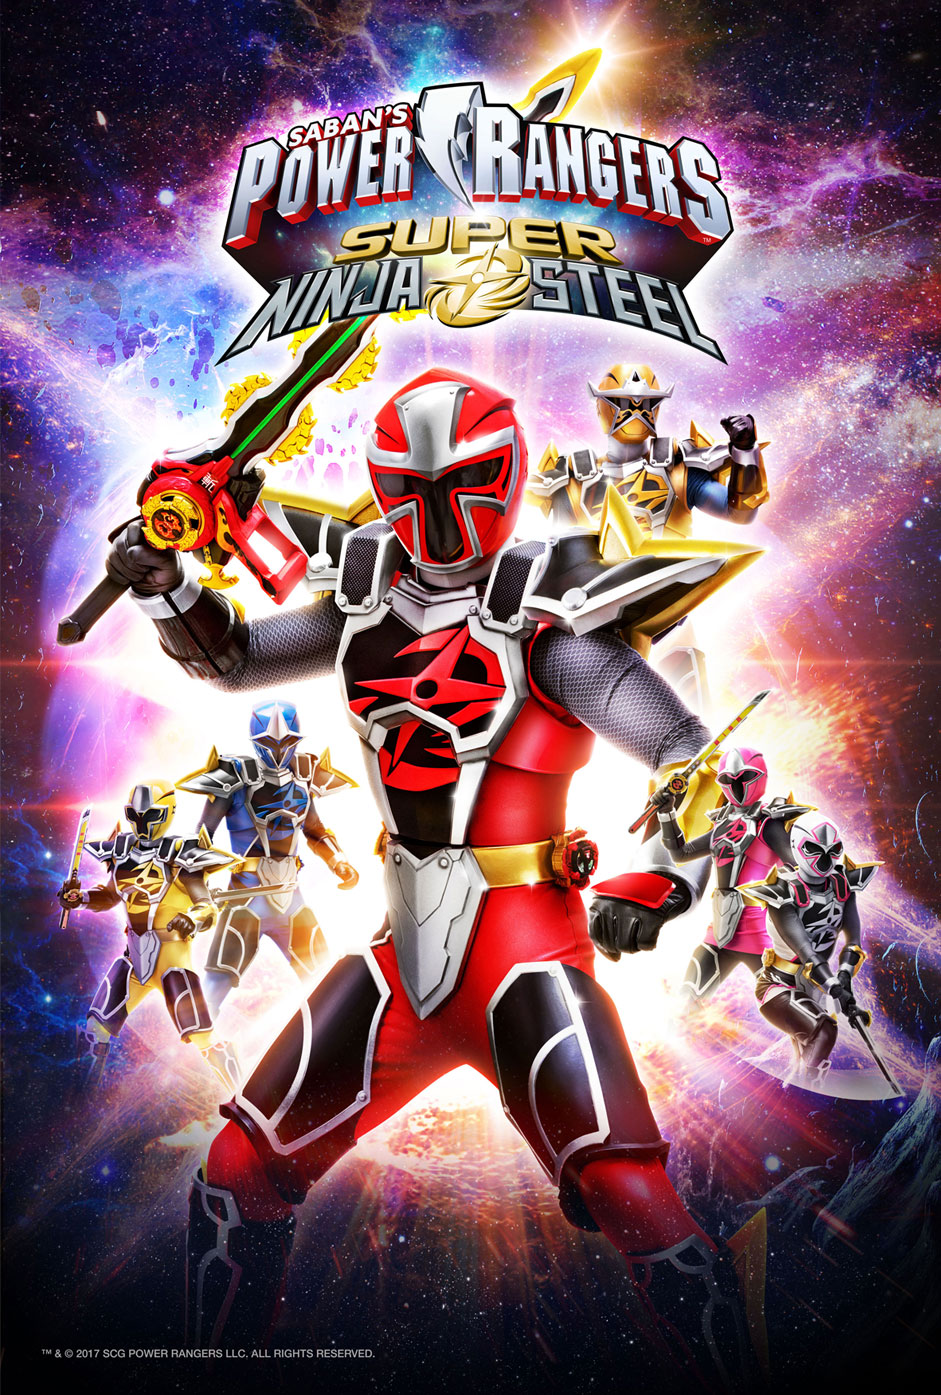 Power_Rangers_Super_Ninja_Steel_Poster.jpg